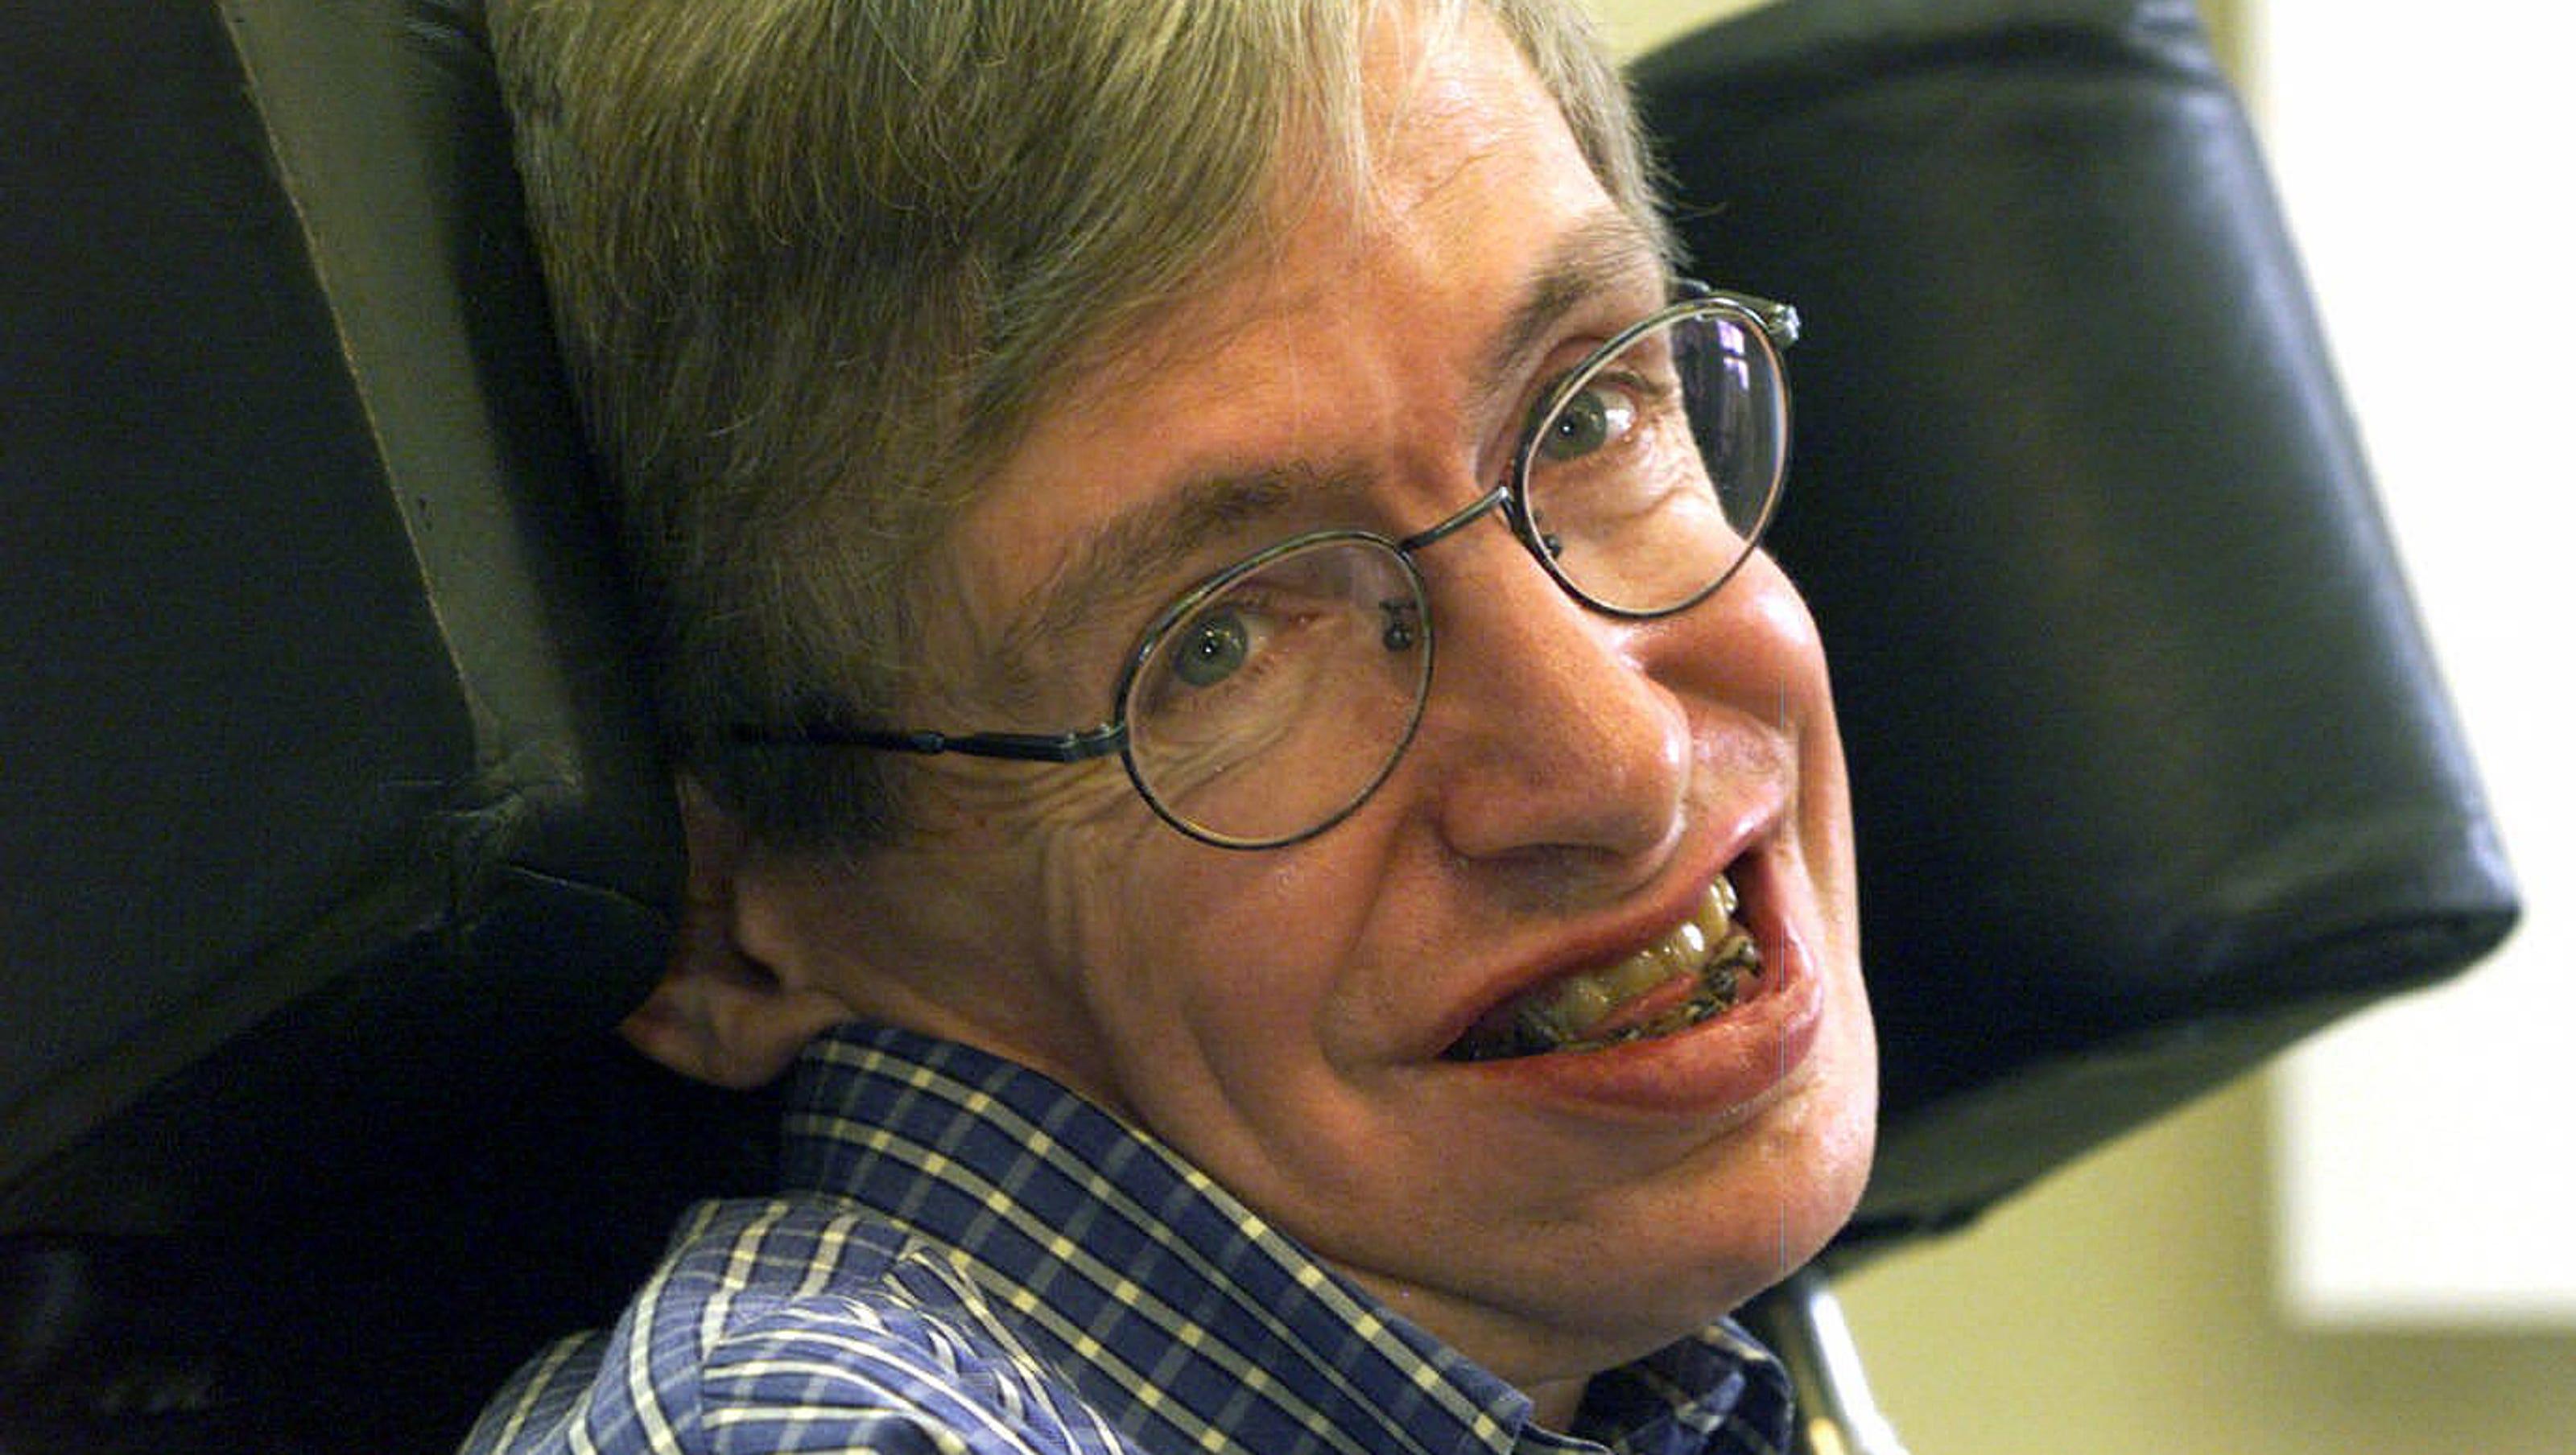 Stephen Hawking Image: Stephen Hawking: His Beliefs On God And Heaven